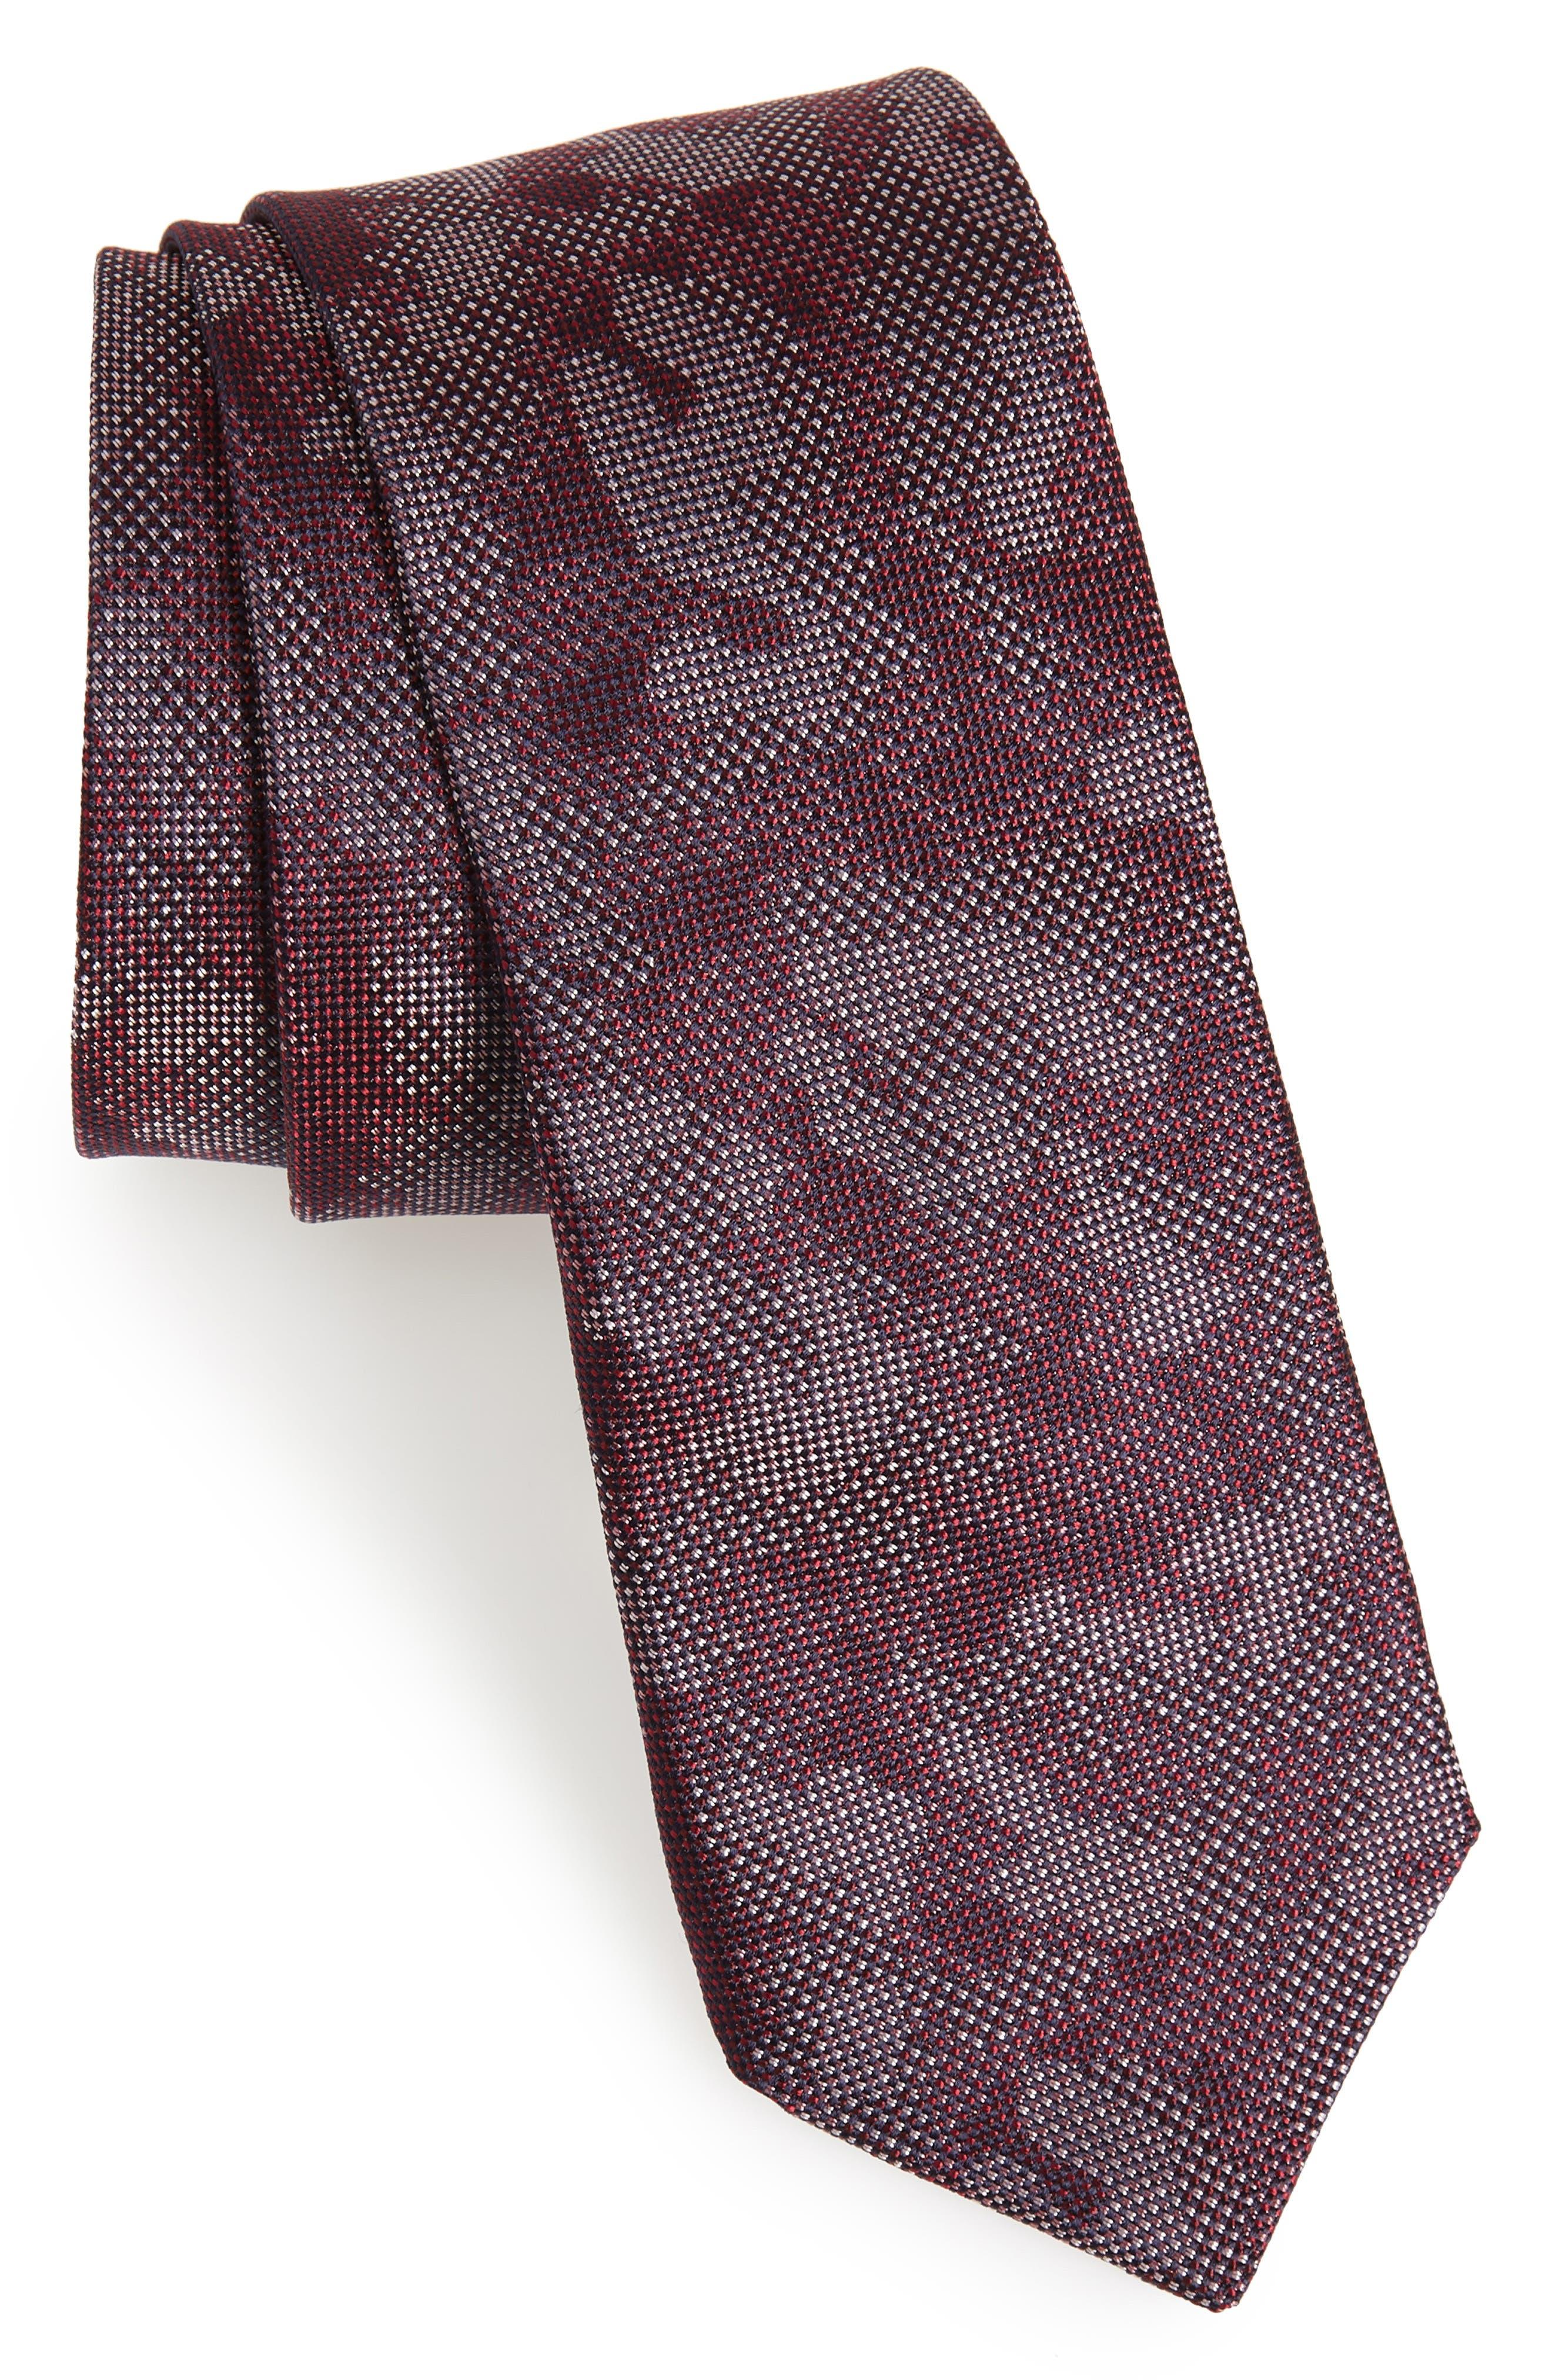 Camo Silk Tie,                             Main thumbnail 1, color,                             Burgundy